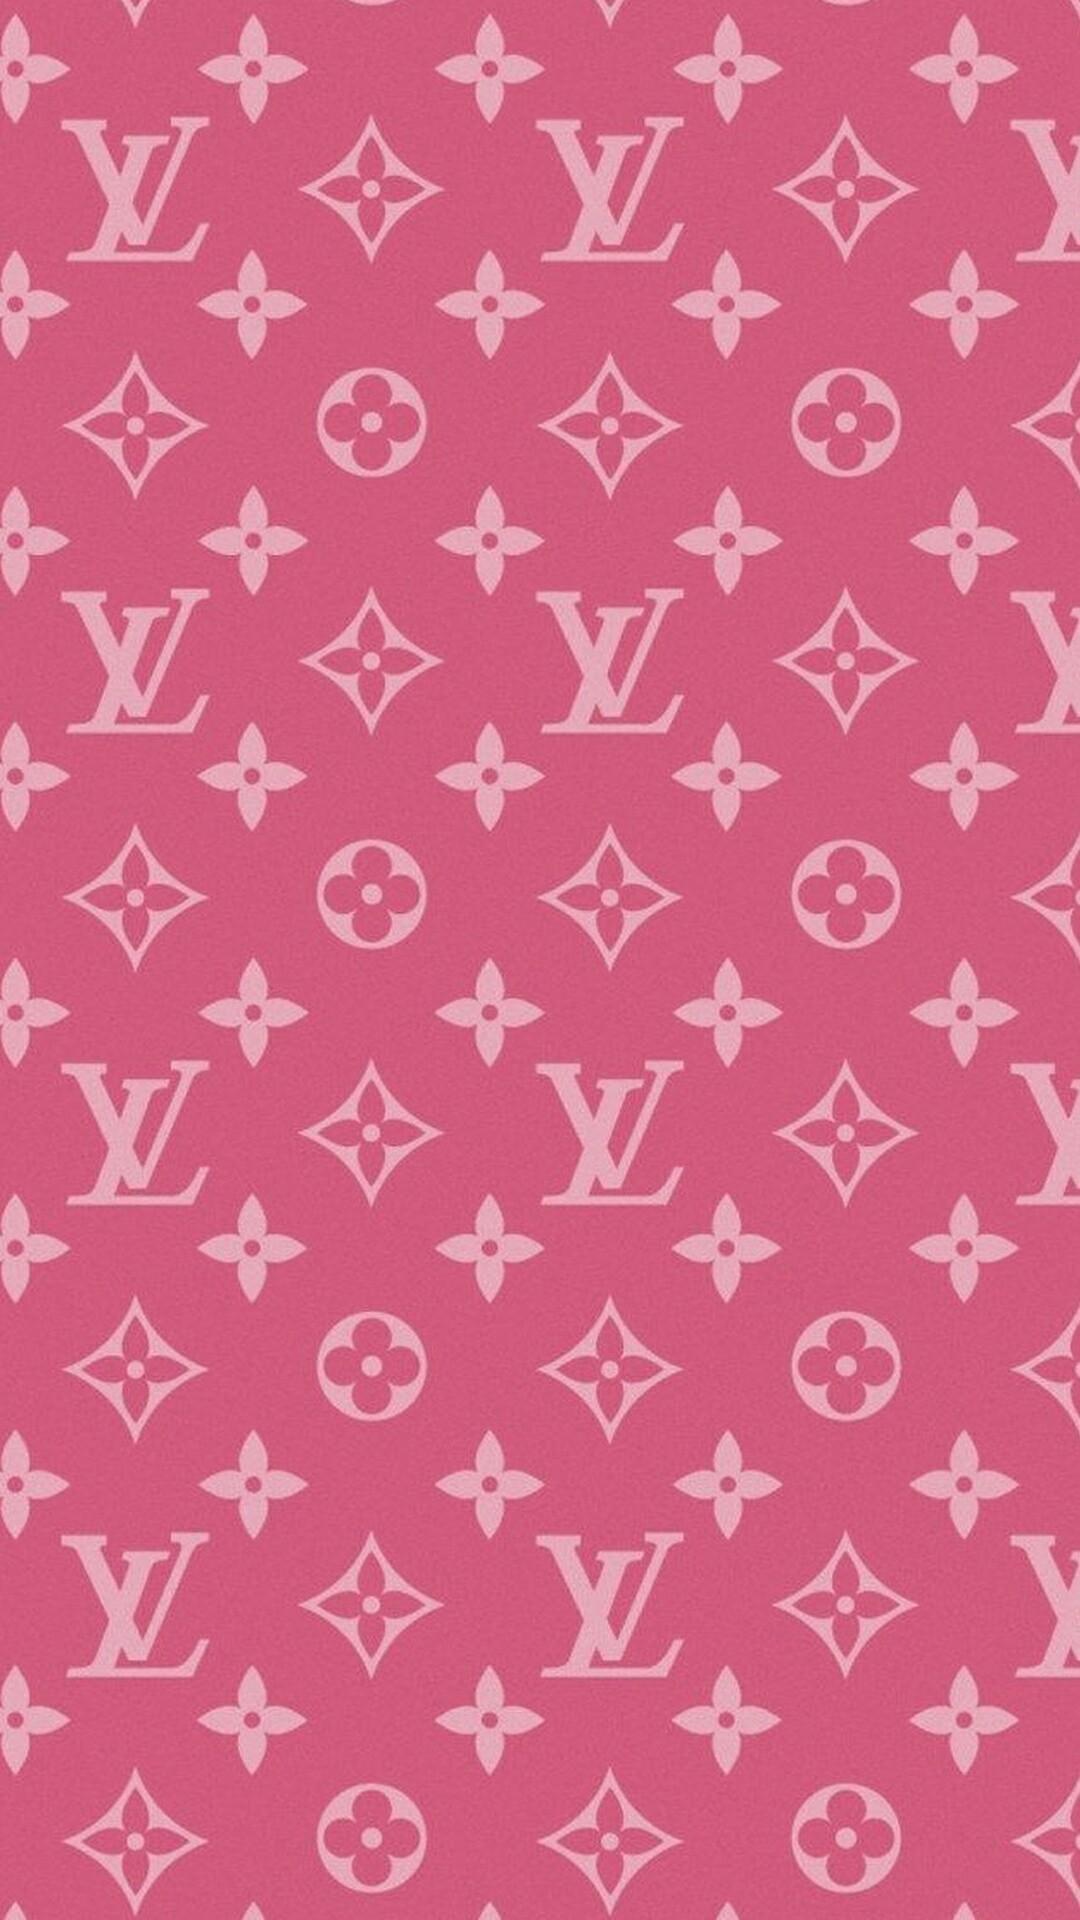 Download Louis Vuitton Wallpaper Hd Backgrounds Download